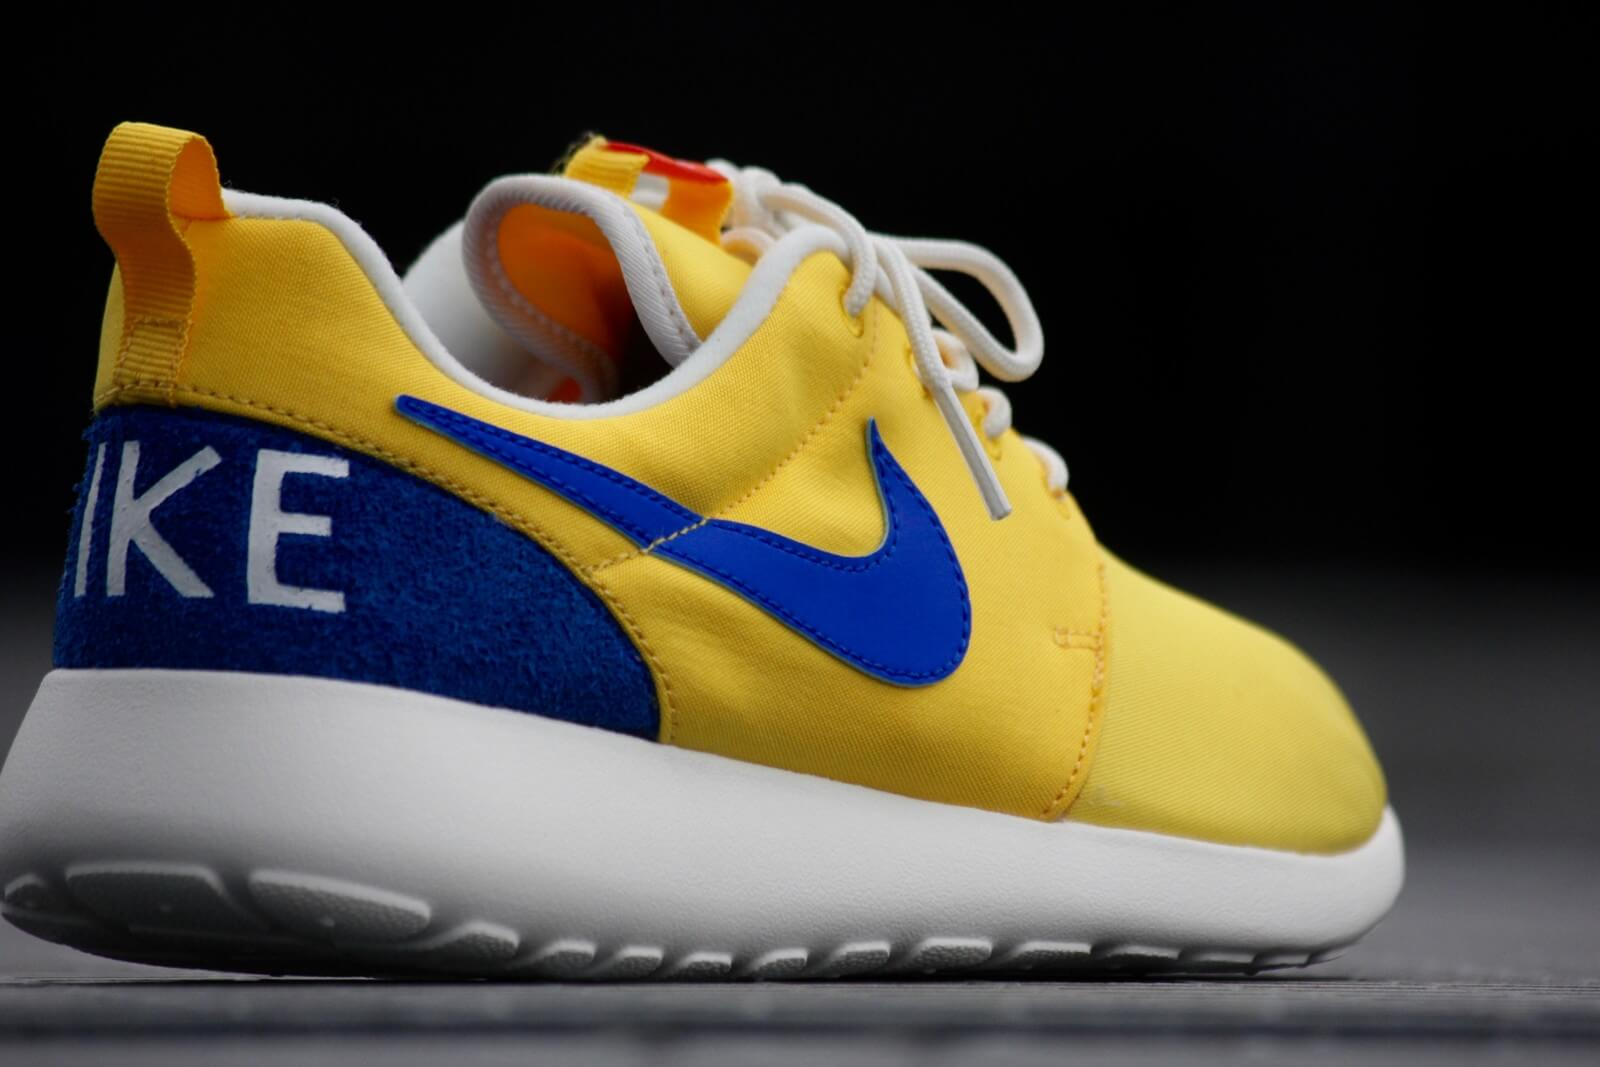 Nike Roshe One Retro Varsity Maize Racer Blue Sail 819881 741